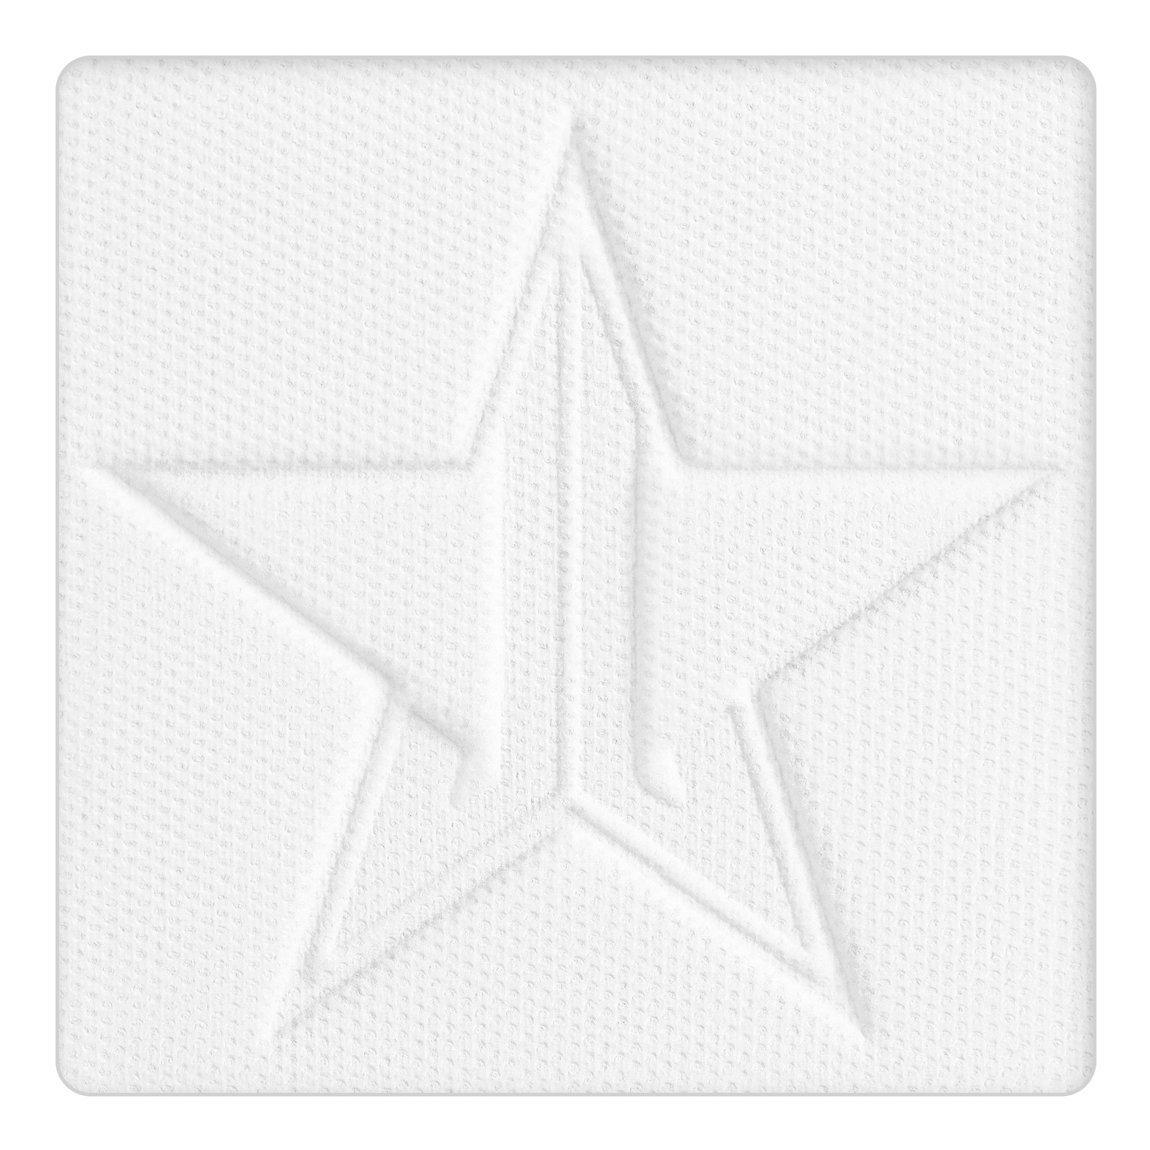 Jeffree Star Cosmetics Artistry Singles Glucose alternative view 1.